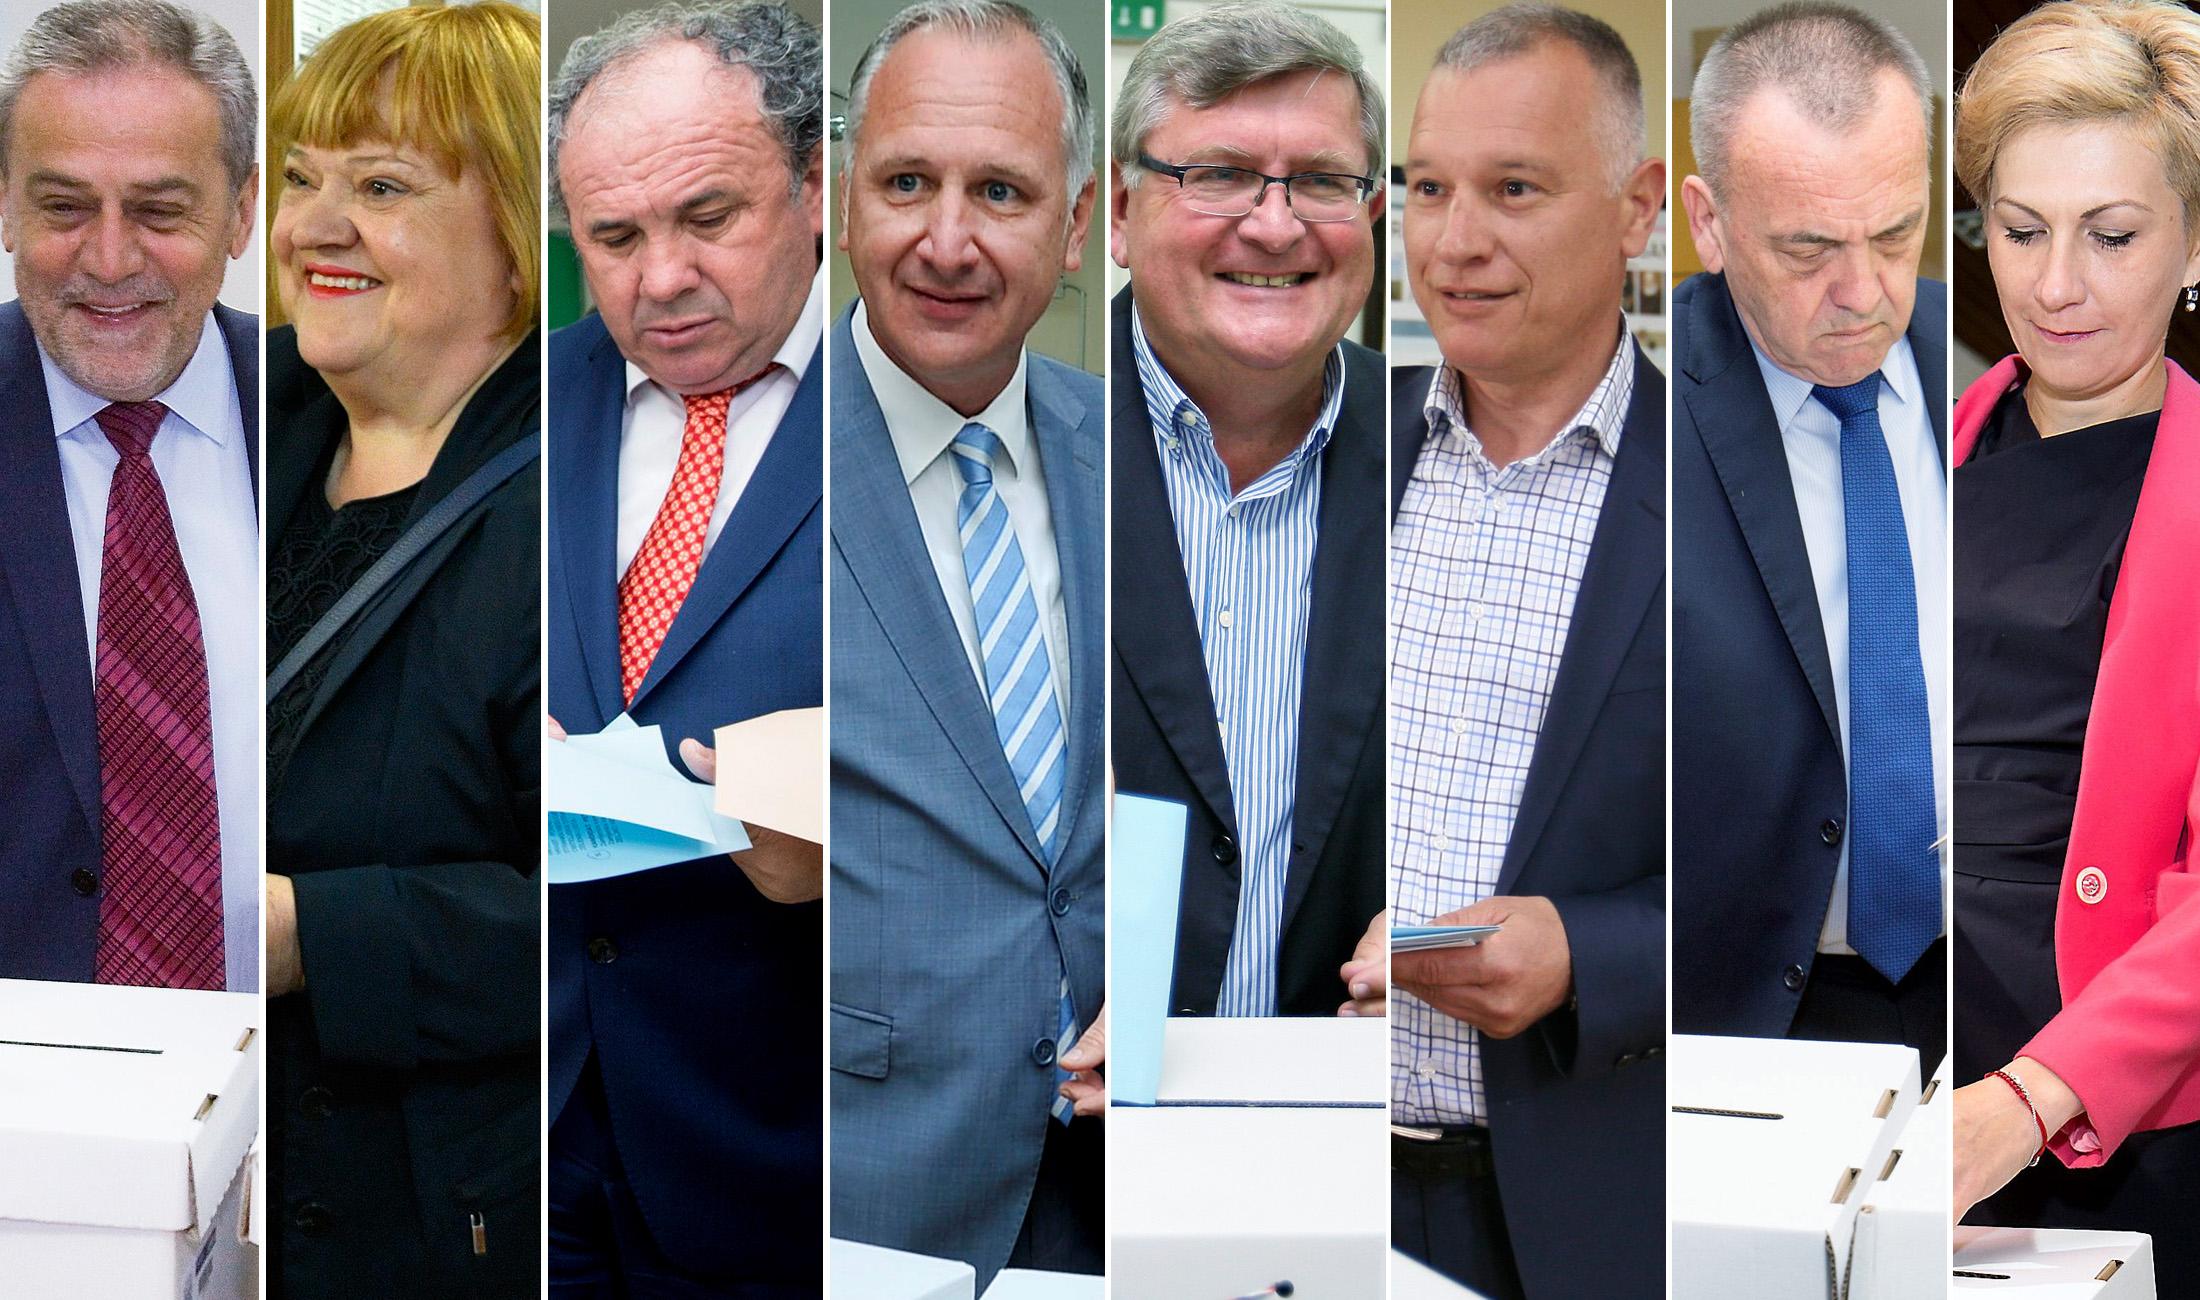 Milan Bandić, Anka Mrak-Taritaš, Željko Kerum, Andro Krstulović Opara, Vojko Obersnel, Hrvoje Burić, Ivica Vrkić i Ivana Šojat